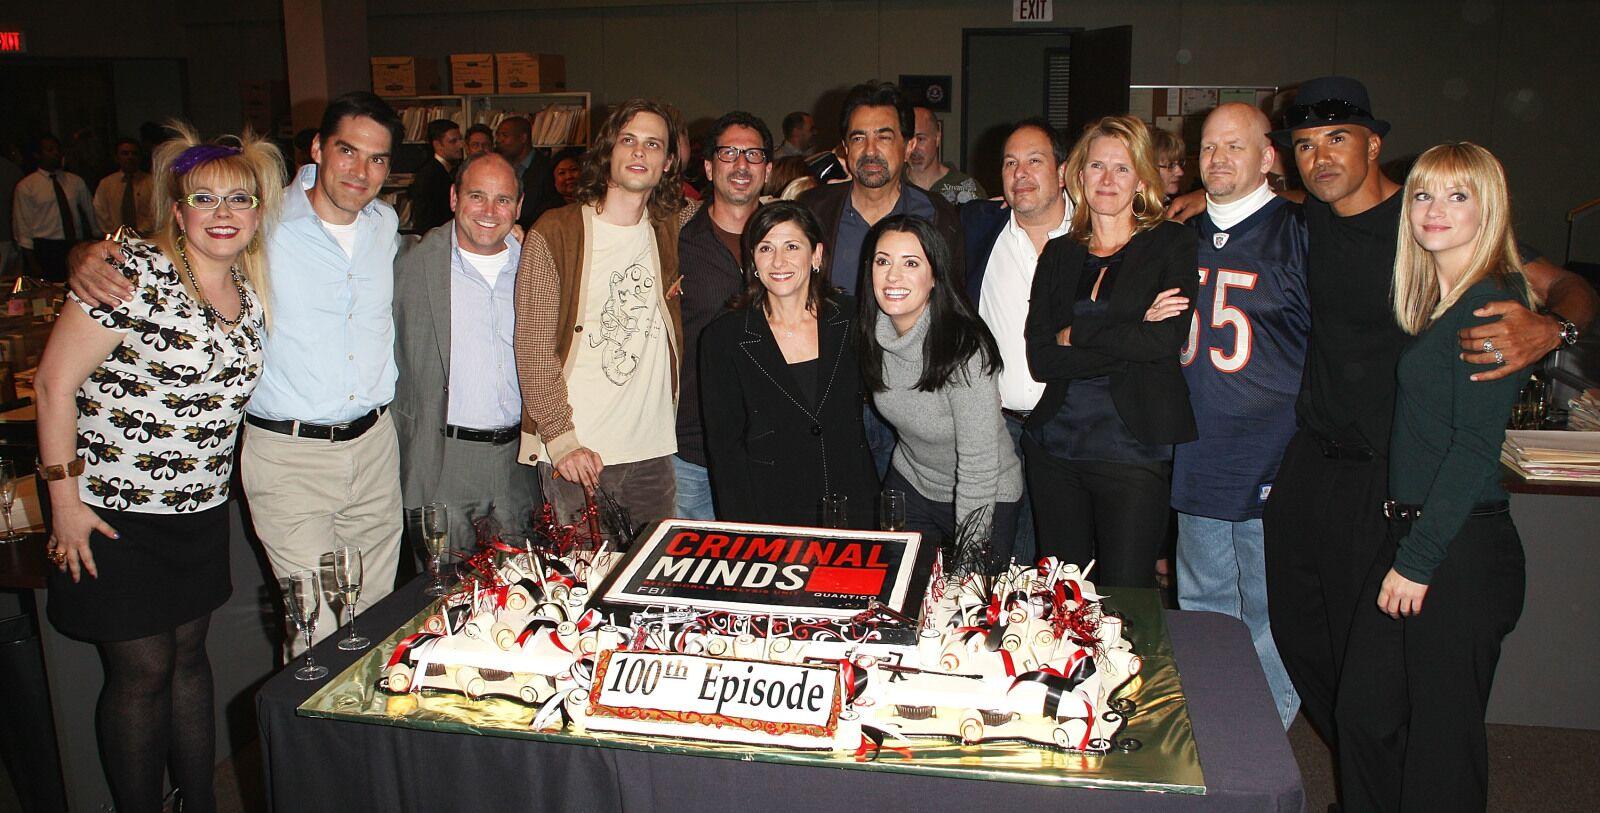 When will Criminal Minds season 14 be on Netflix?